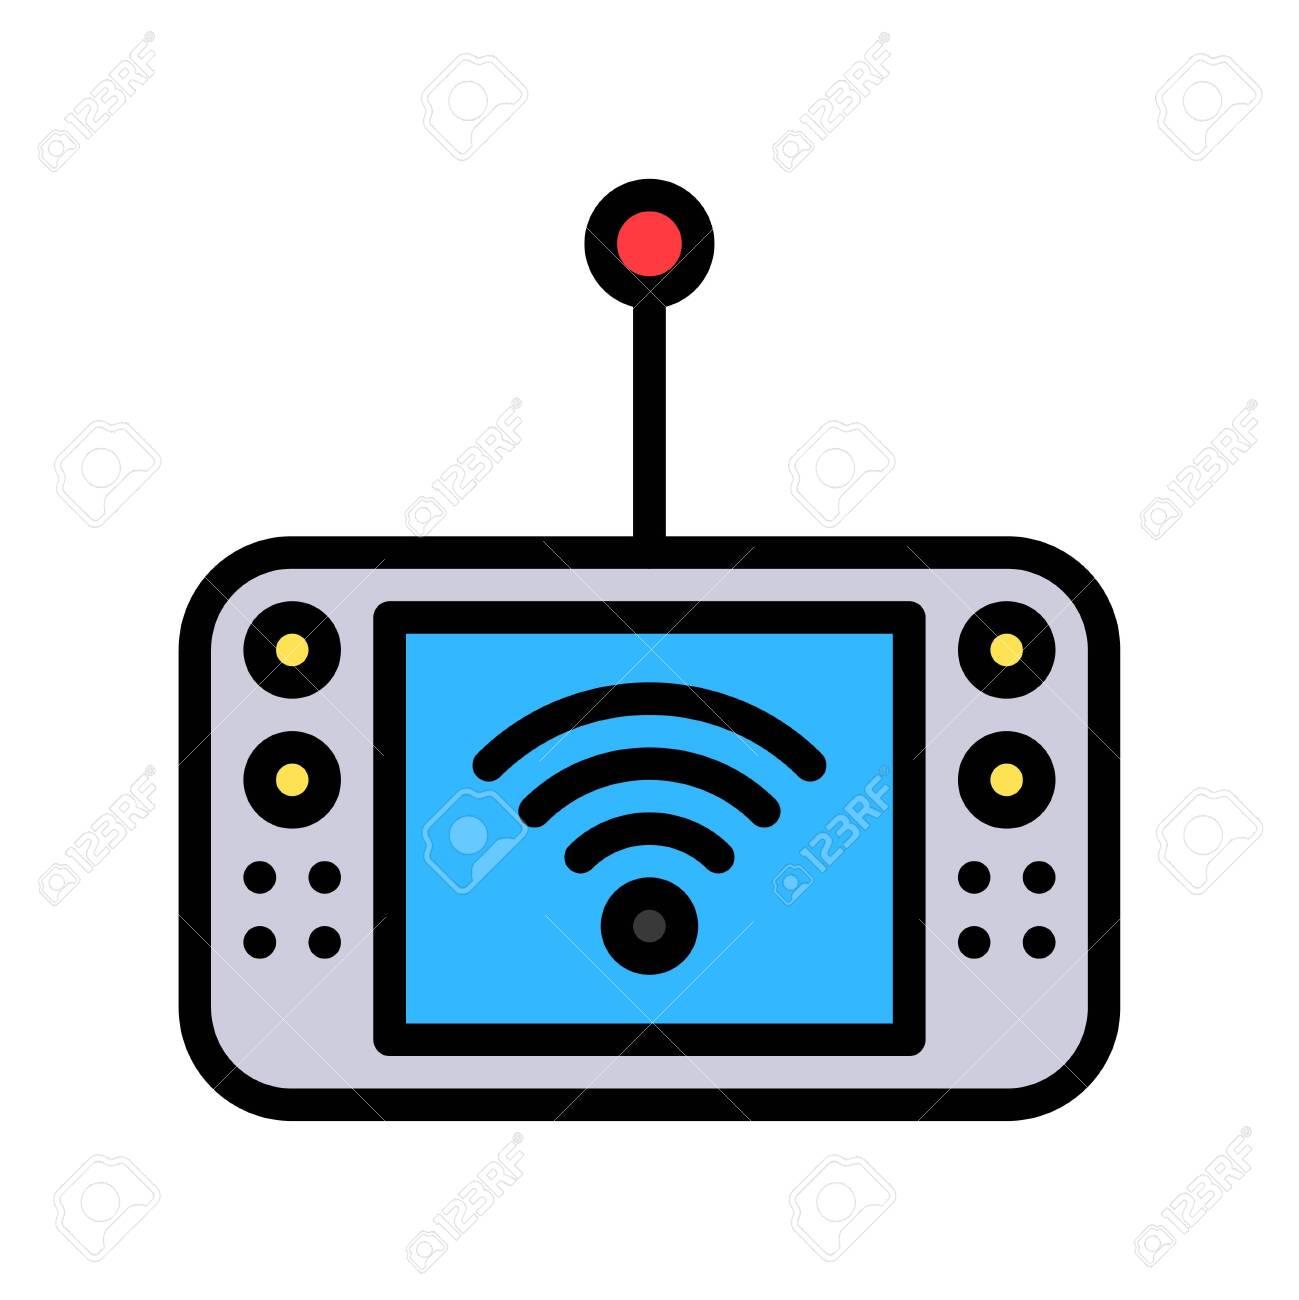 Mobile Internet device vector illustration, Future technology filled design icon - 136140023